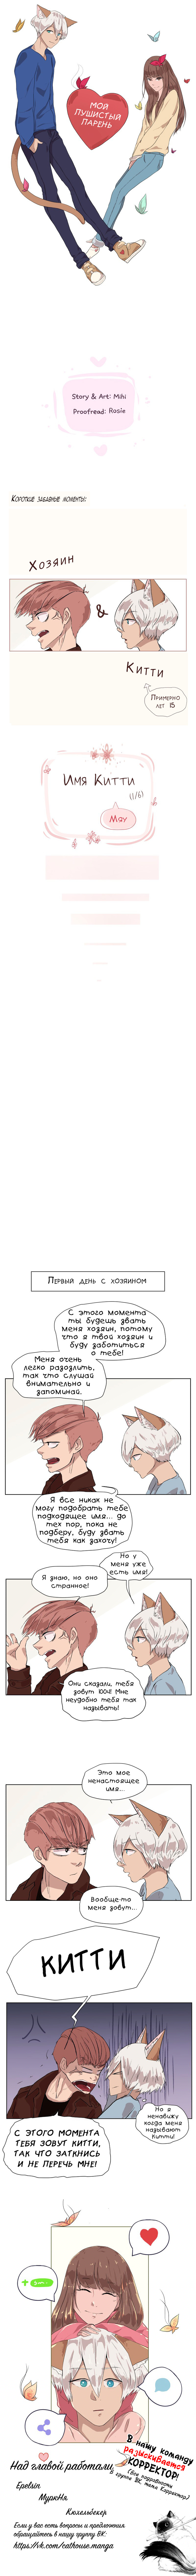 https://r2.ninemanga.com/comics/pic3/58/31802/1287507/1544336176782.jpg Page 1